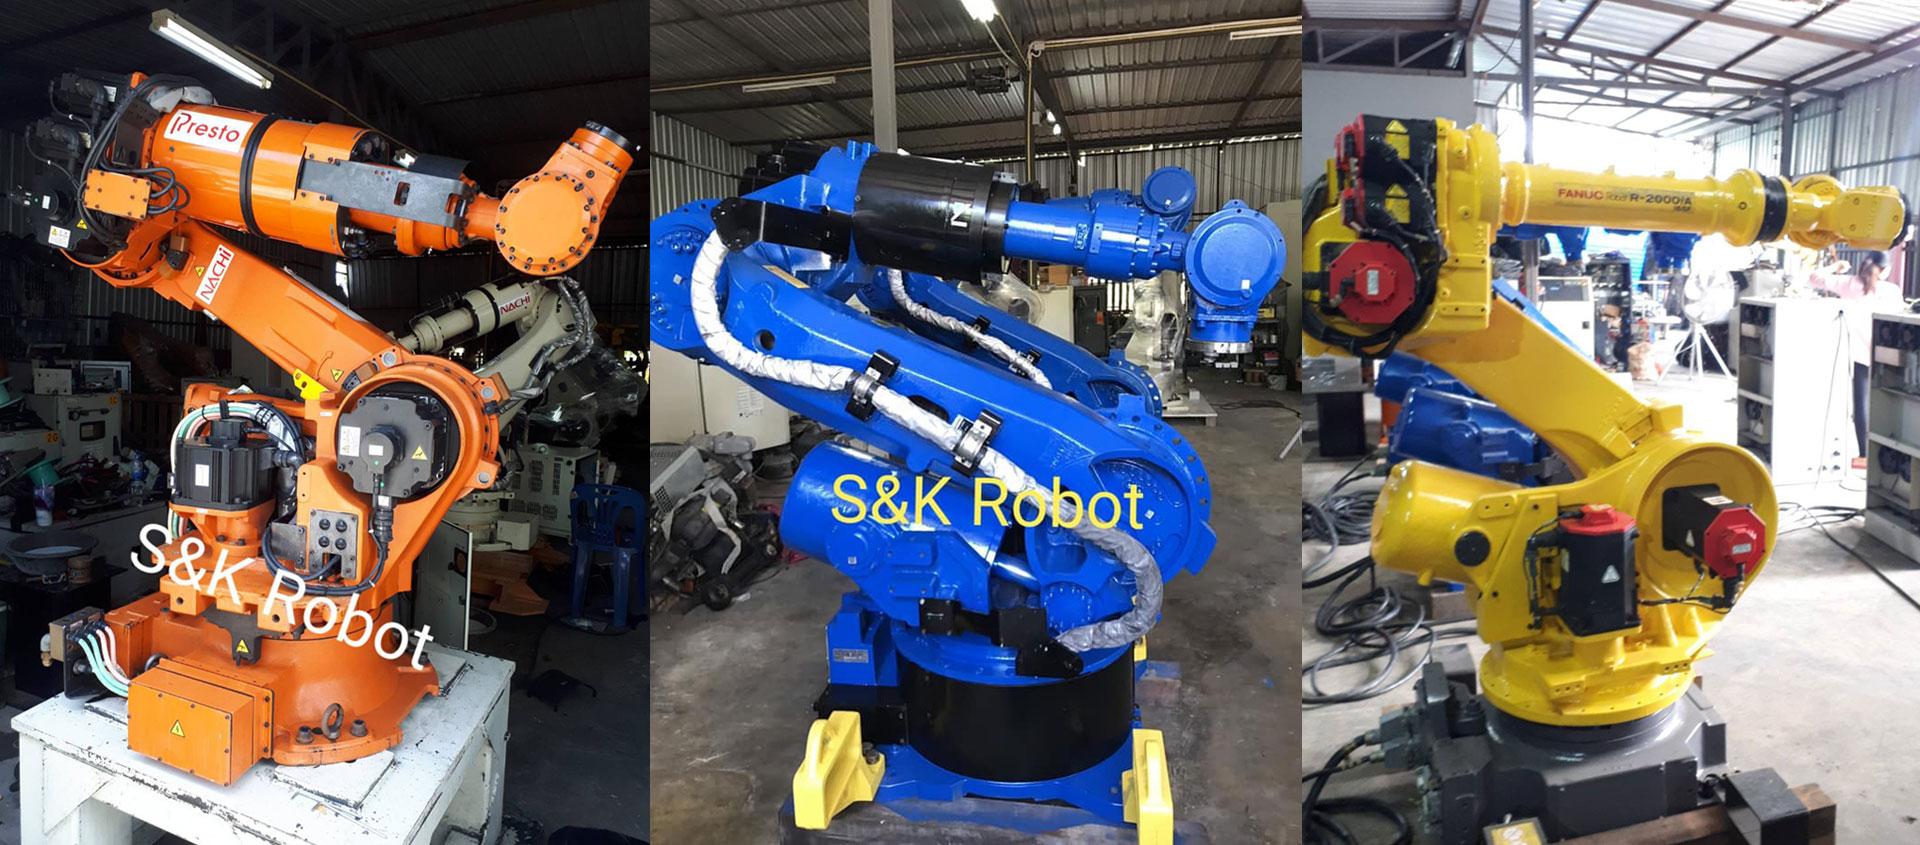 s&k-robot